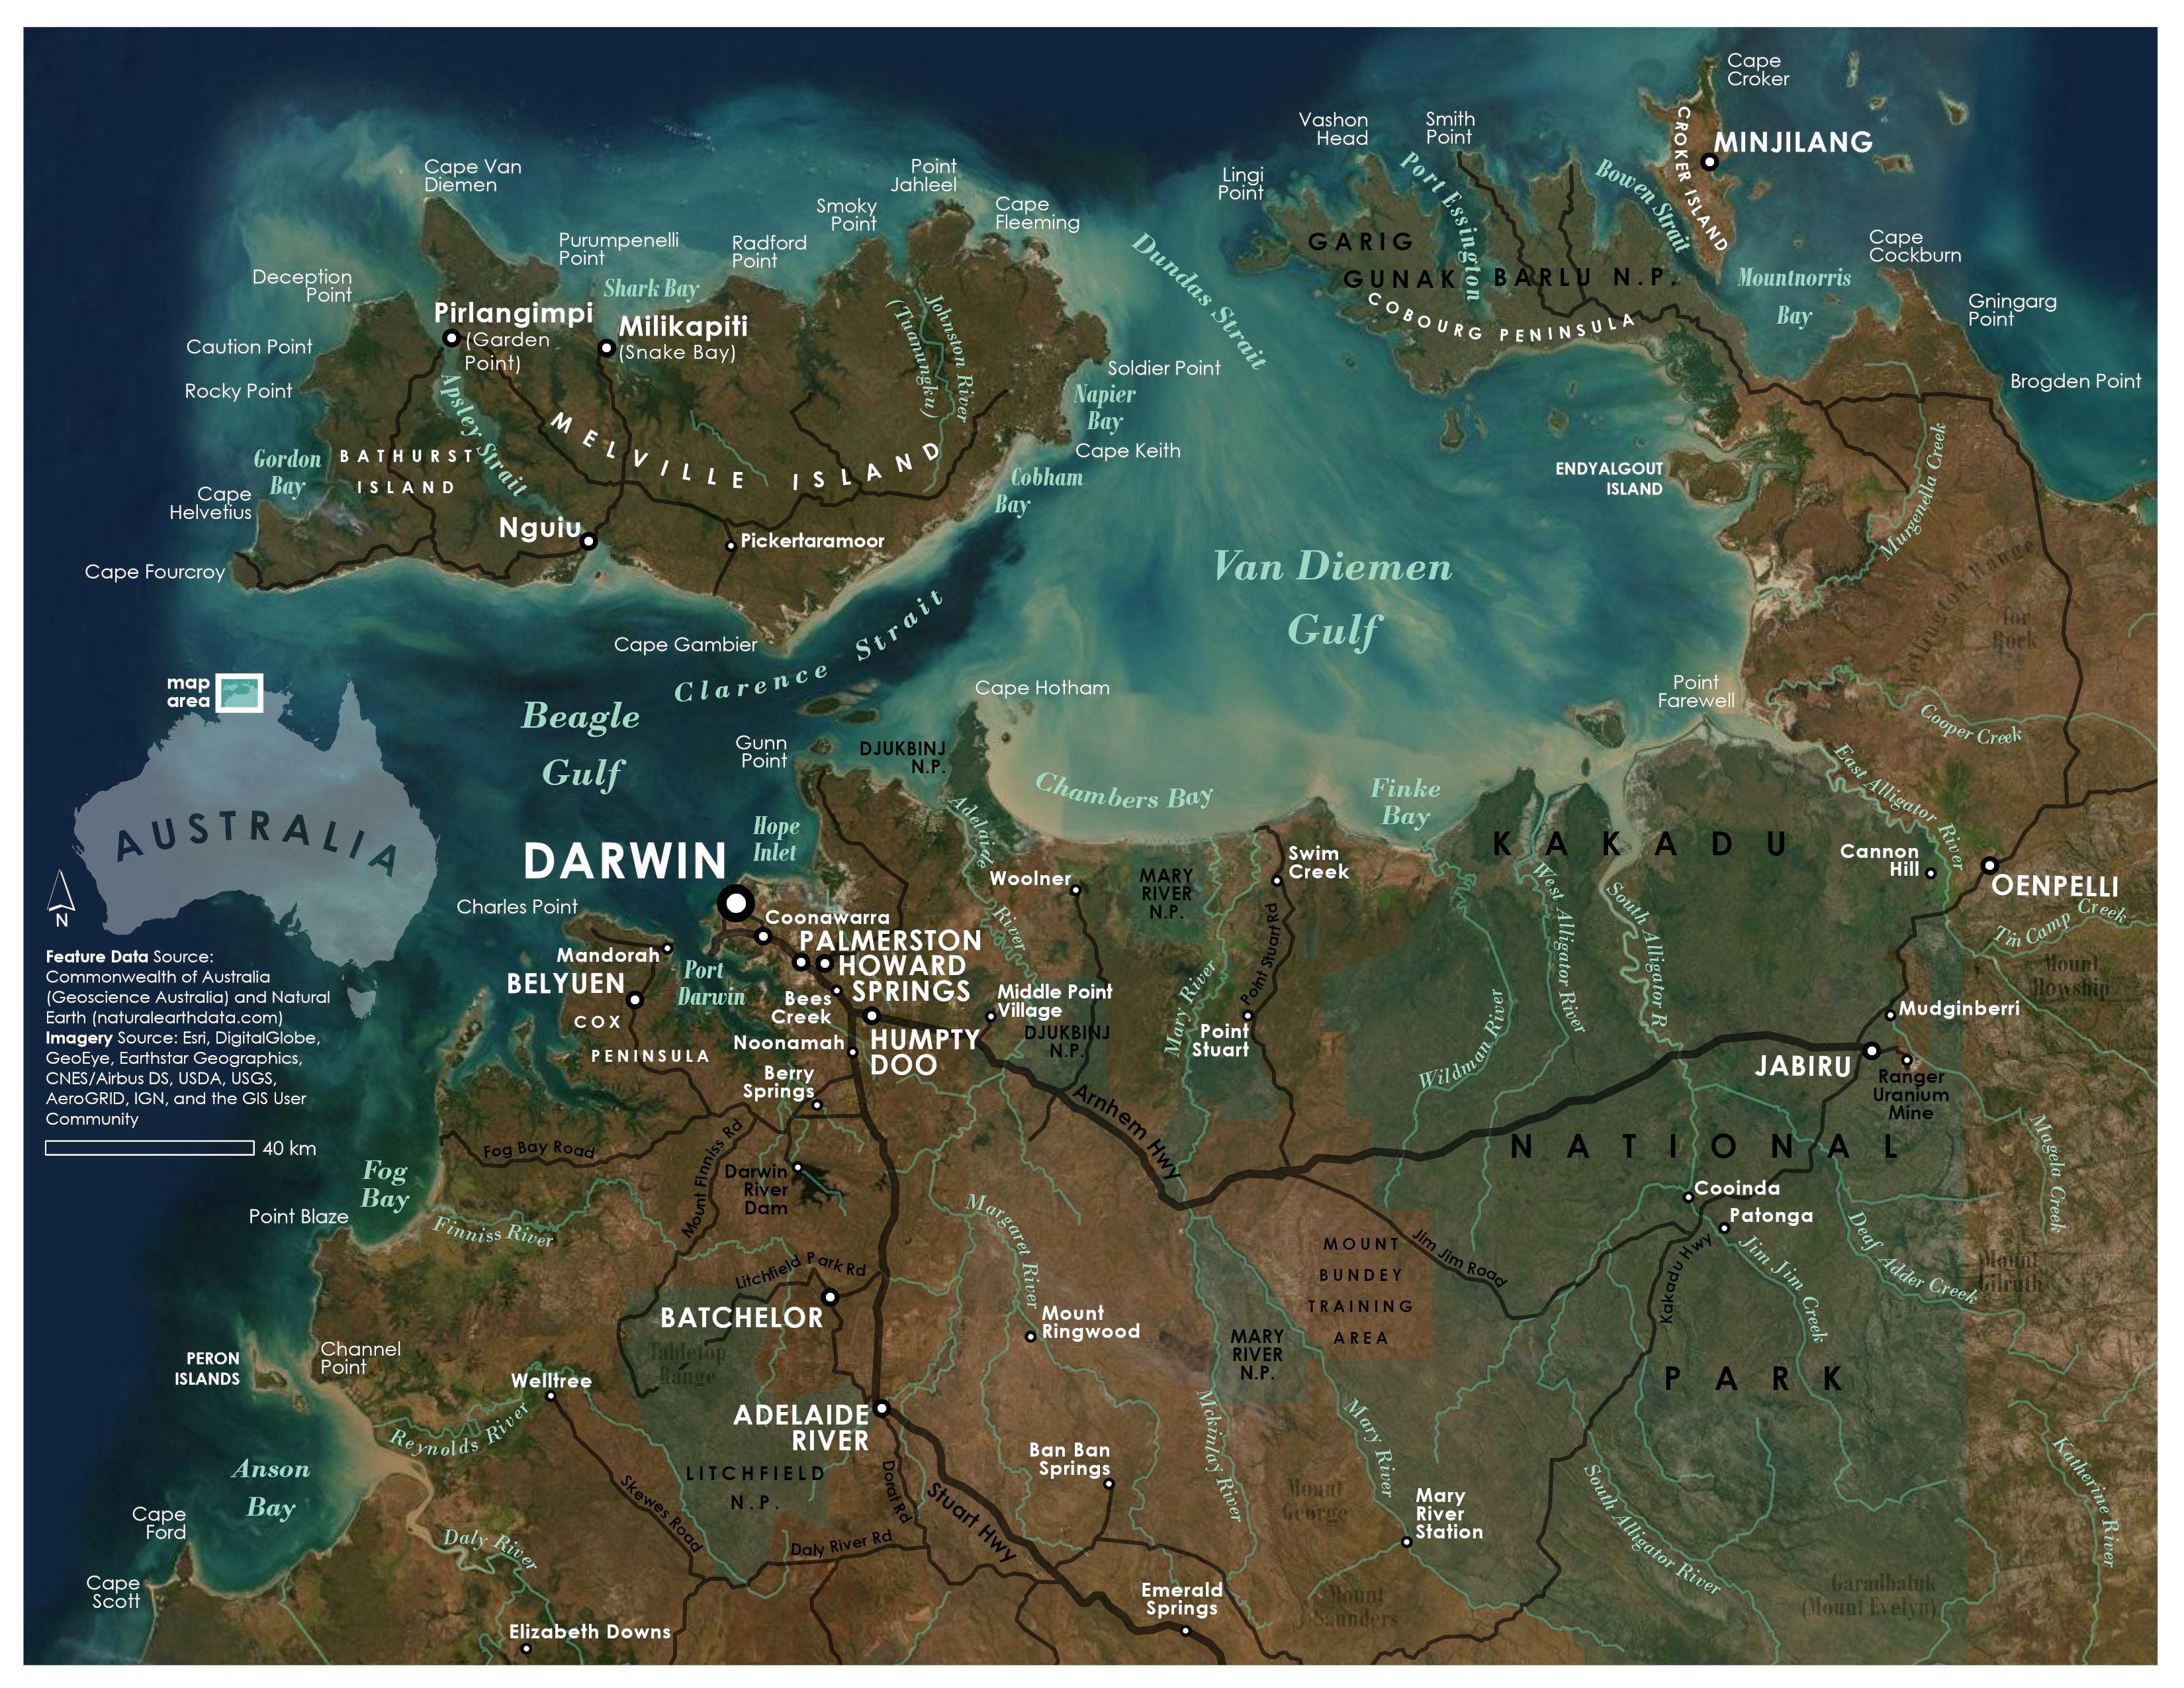 Map of Darwin, Australia and surrounding area